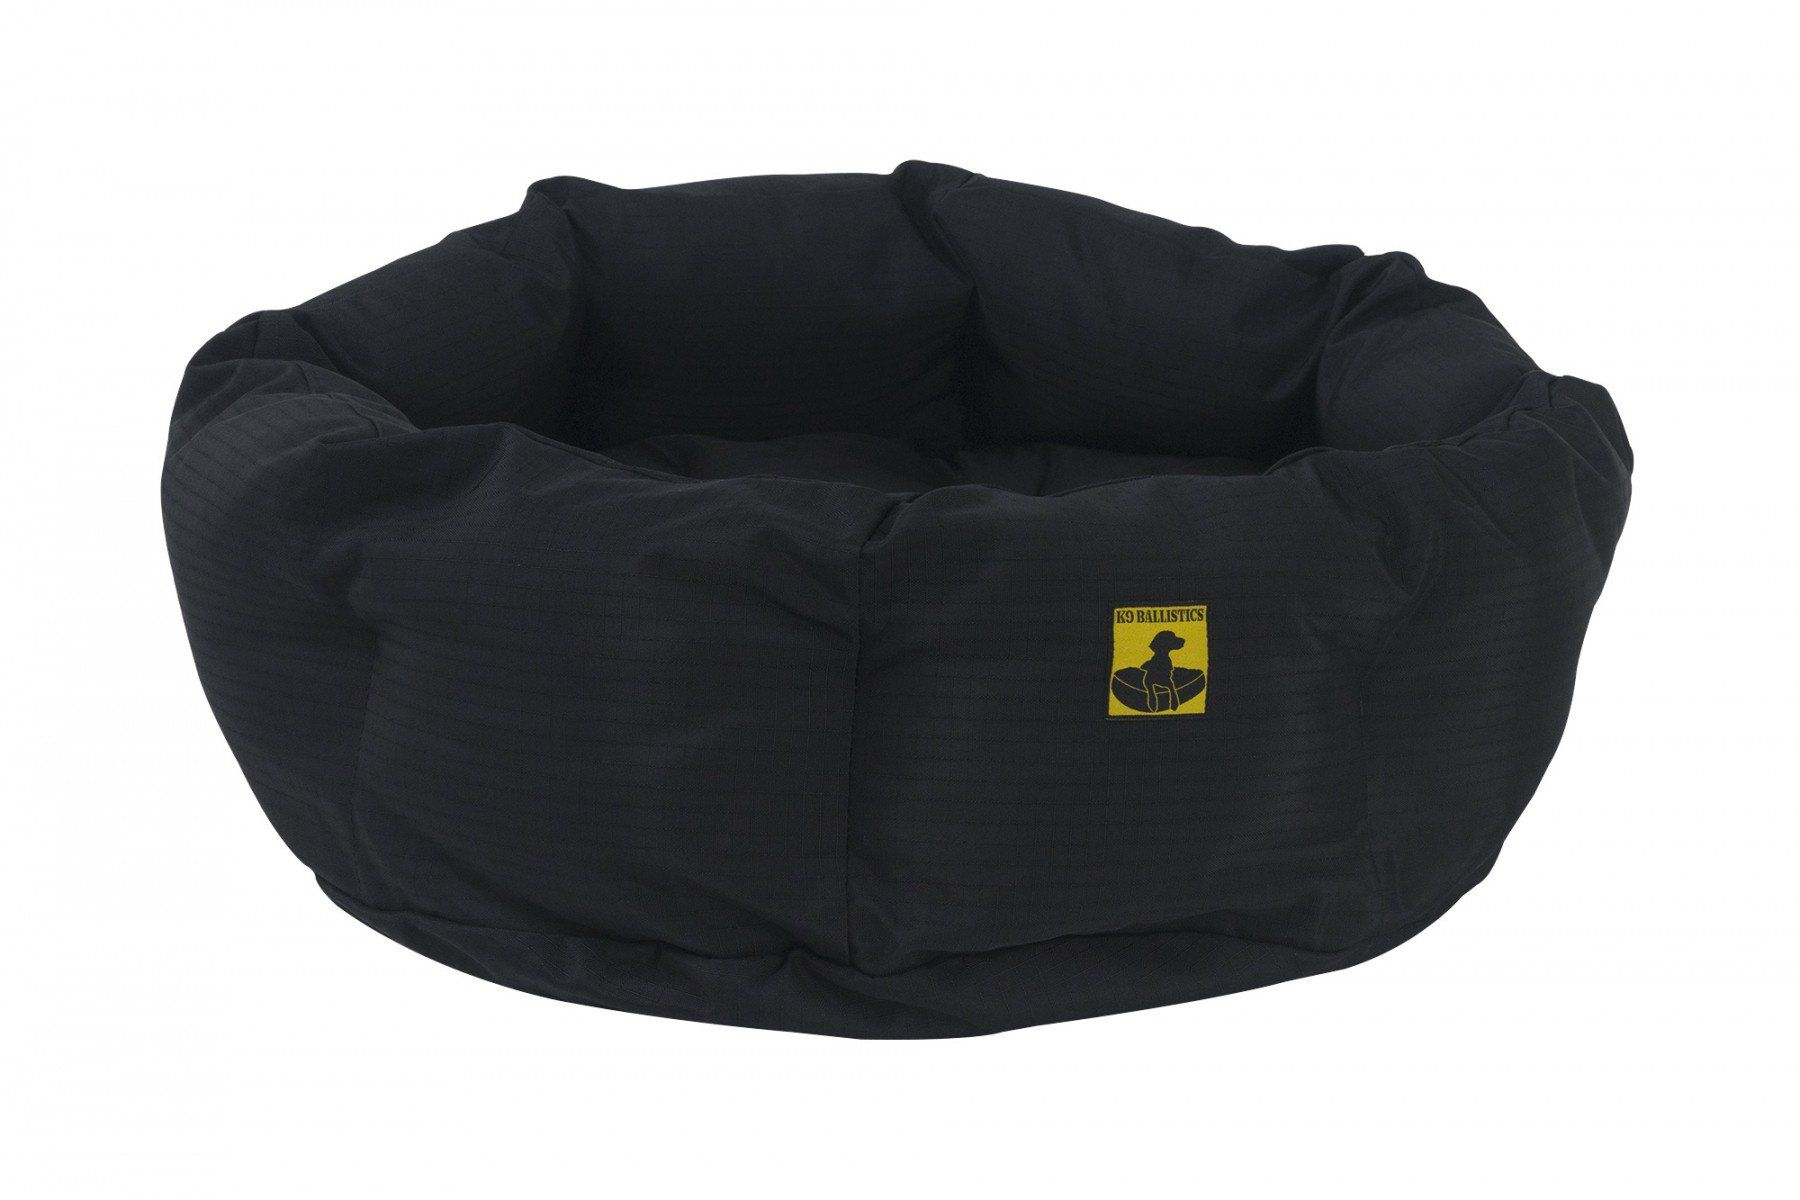 Deep Den Chew Resistant Dog Bed K9 Ballistics Dog bed